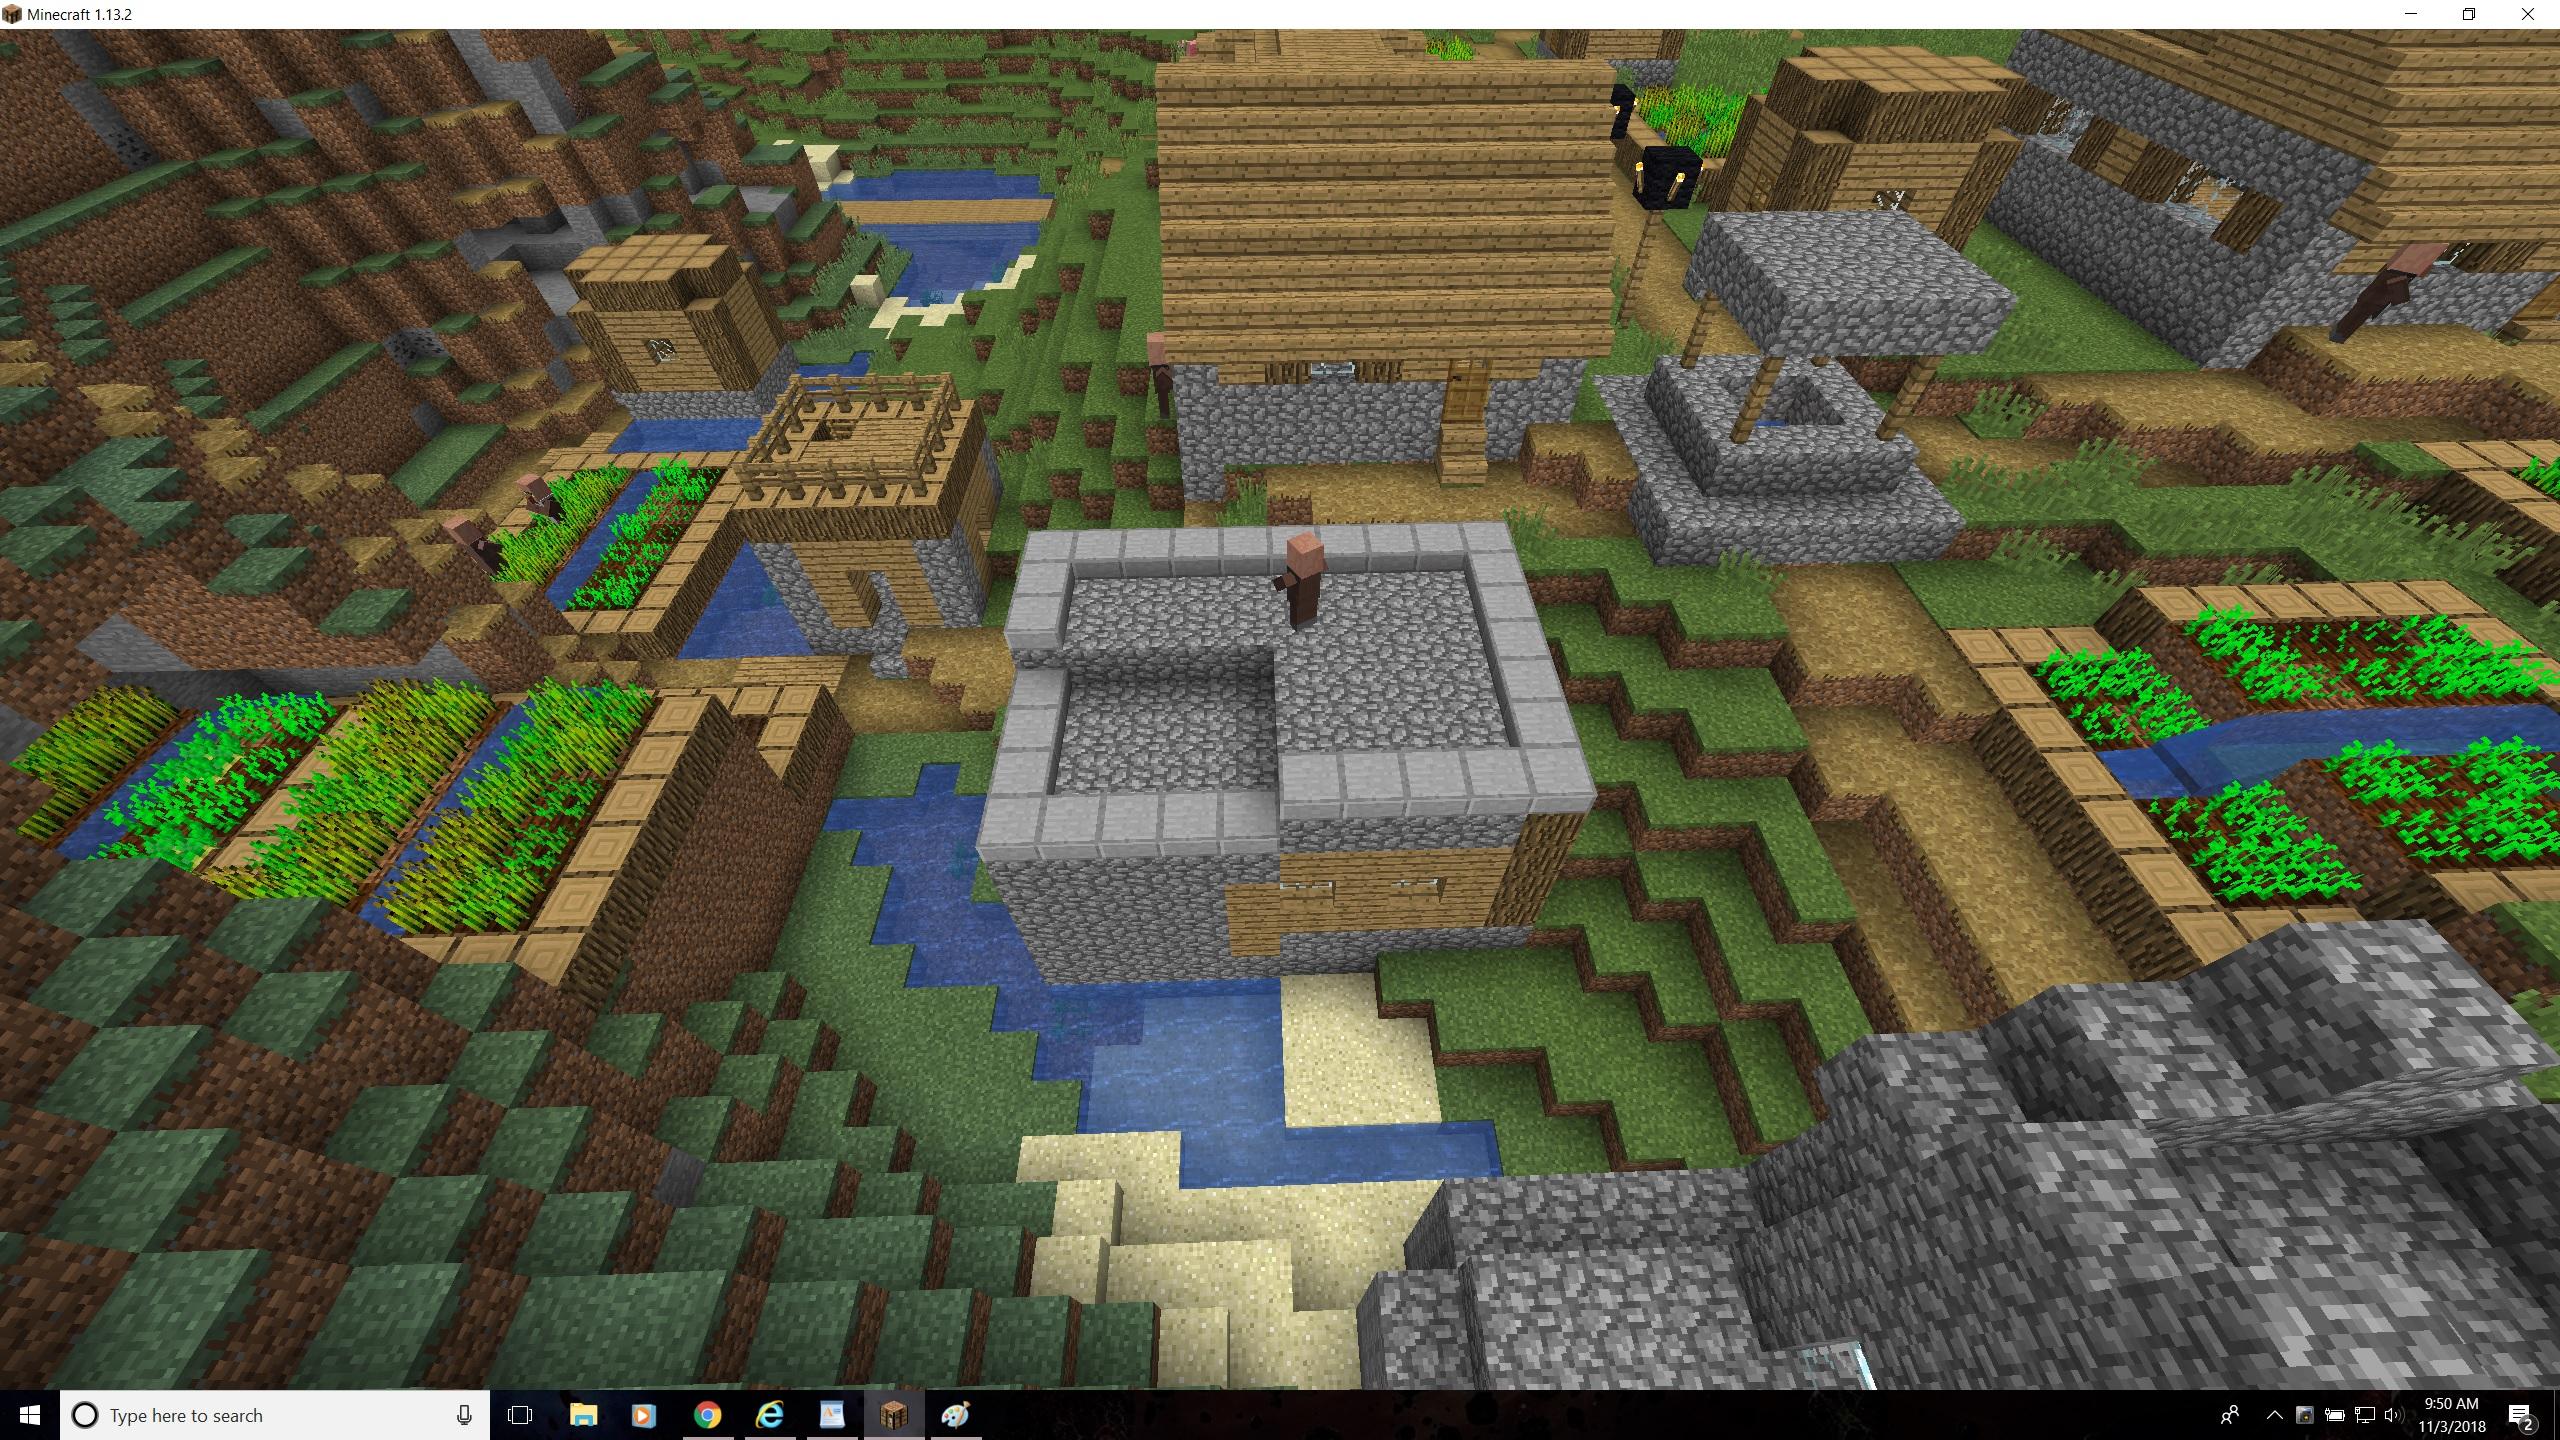 Strange seeds in 1 13 - Seeds - Minecraft: Java Edition